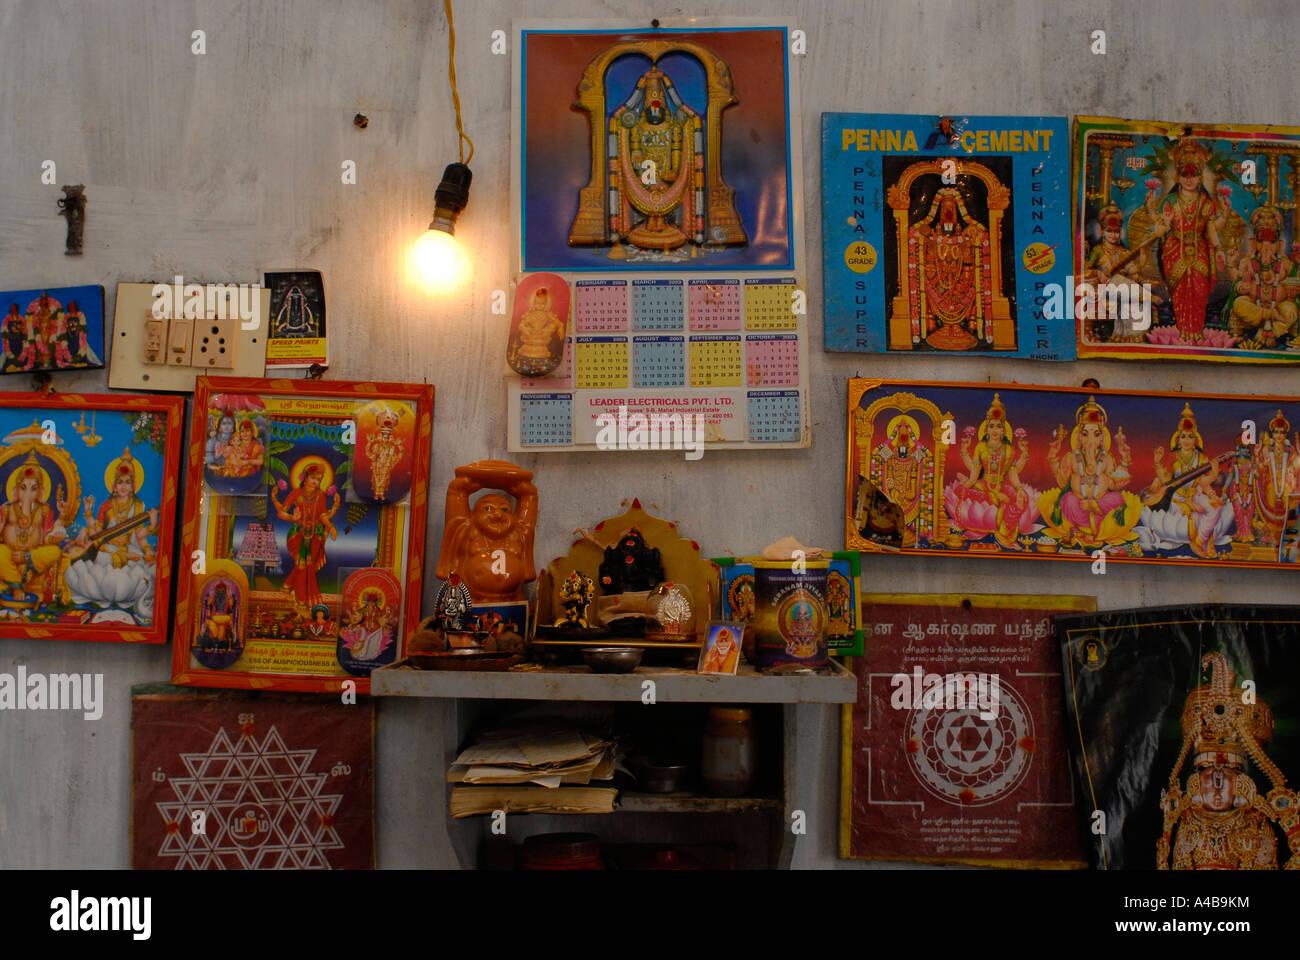 Best Kitchen Gallery: Stock Image Of Hindu Home Shrine To Shiva Stock Photo 10994935 Alamy of Hindu Altar At Home on rachelxblog.com